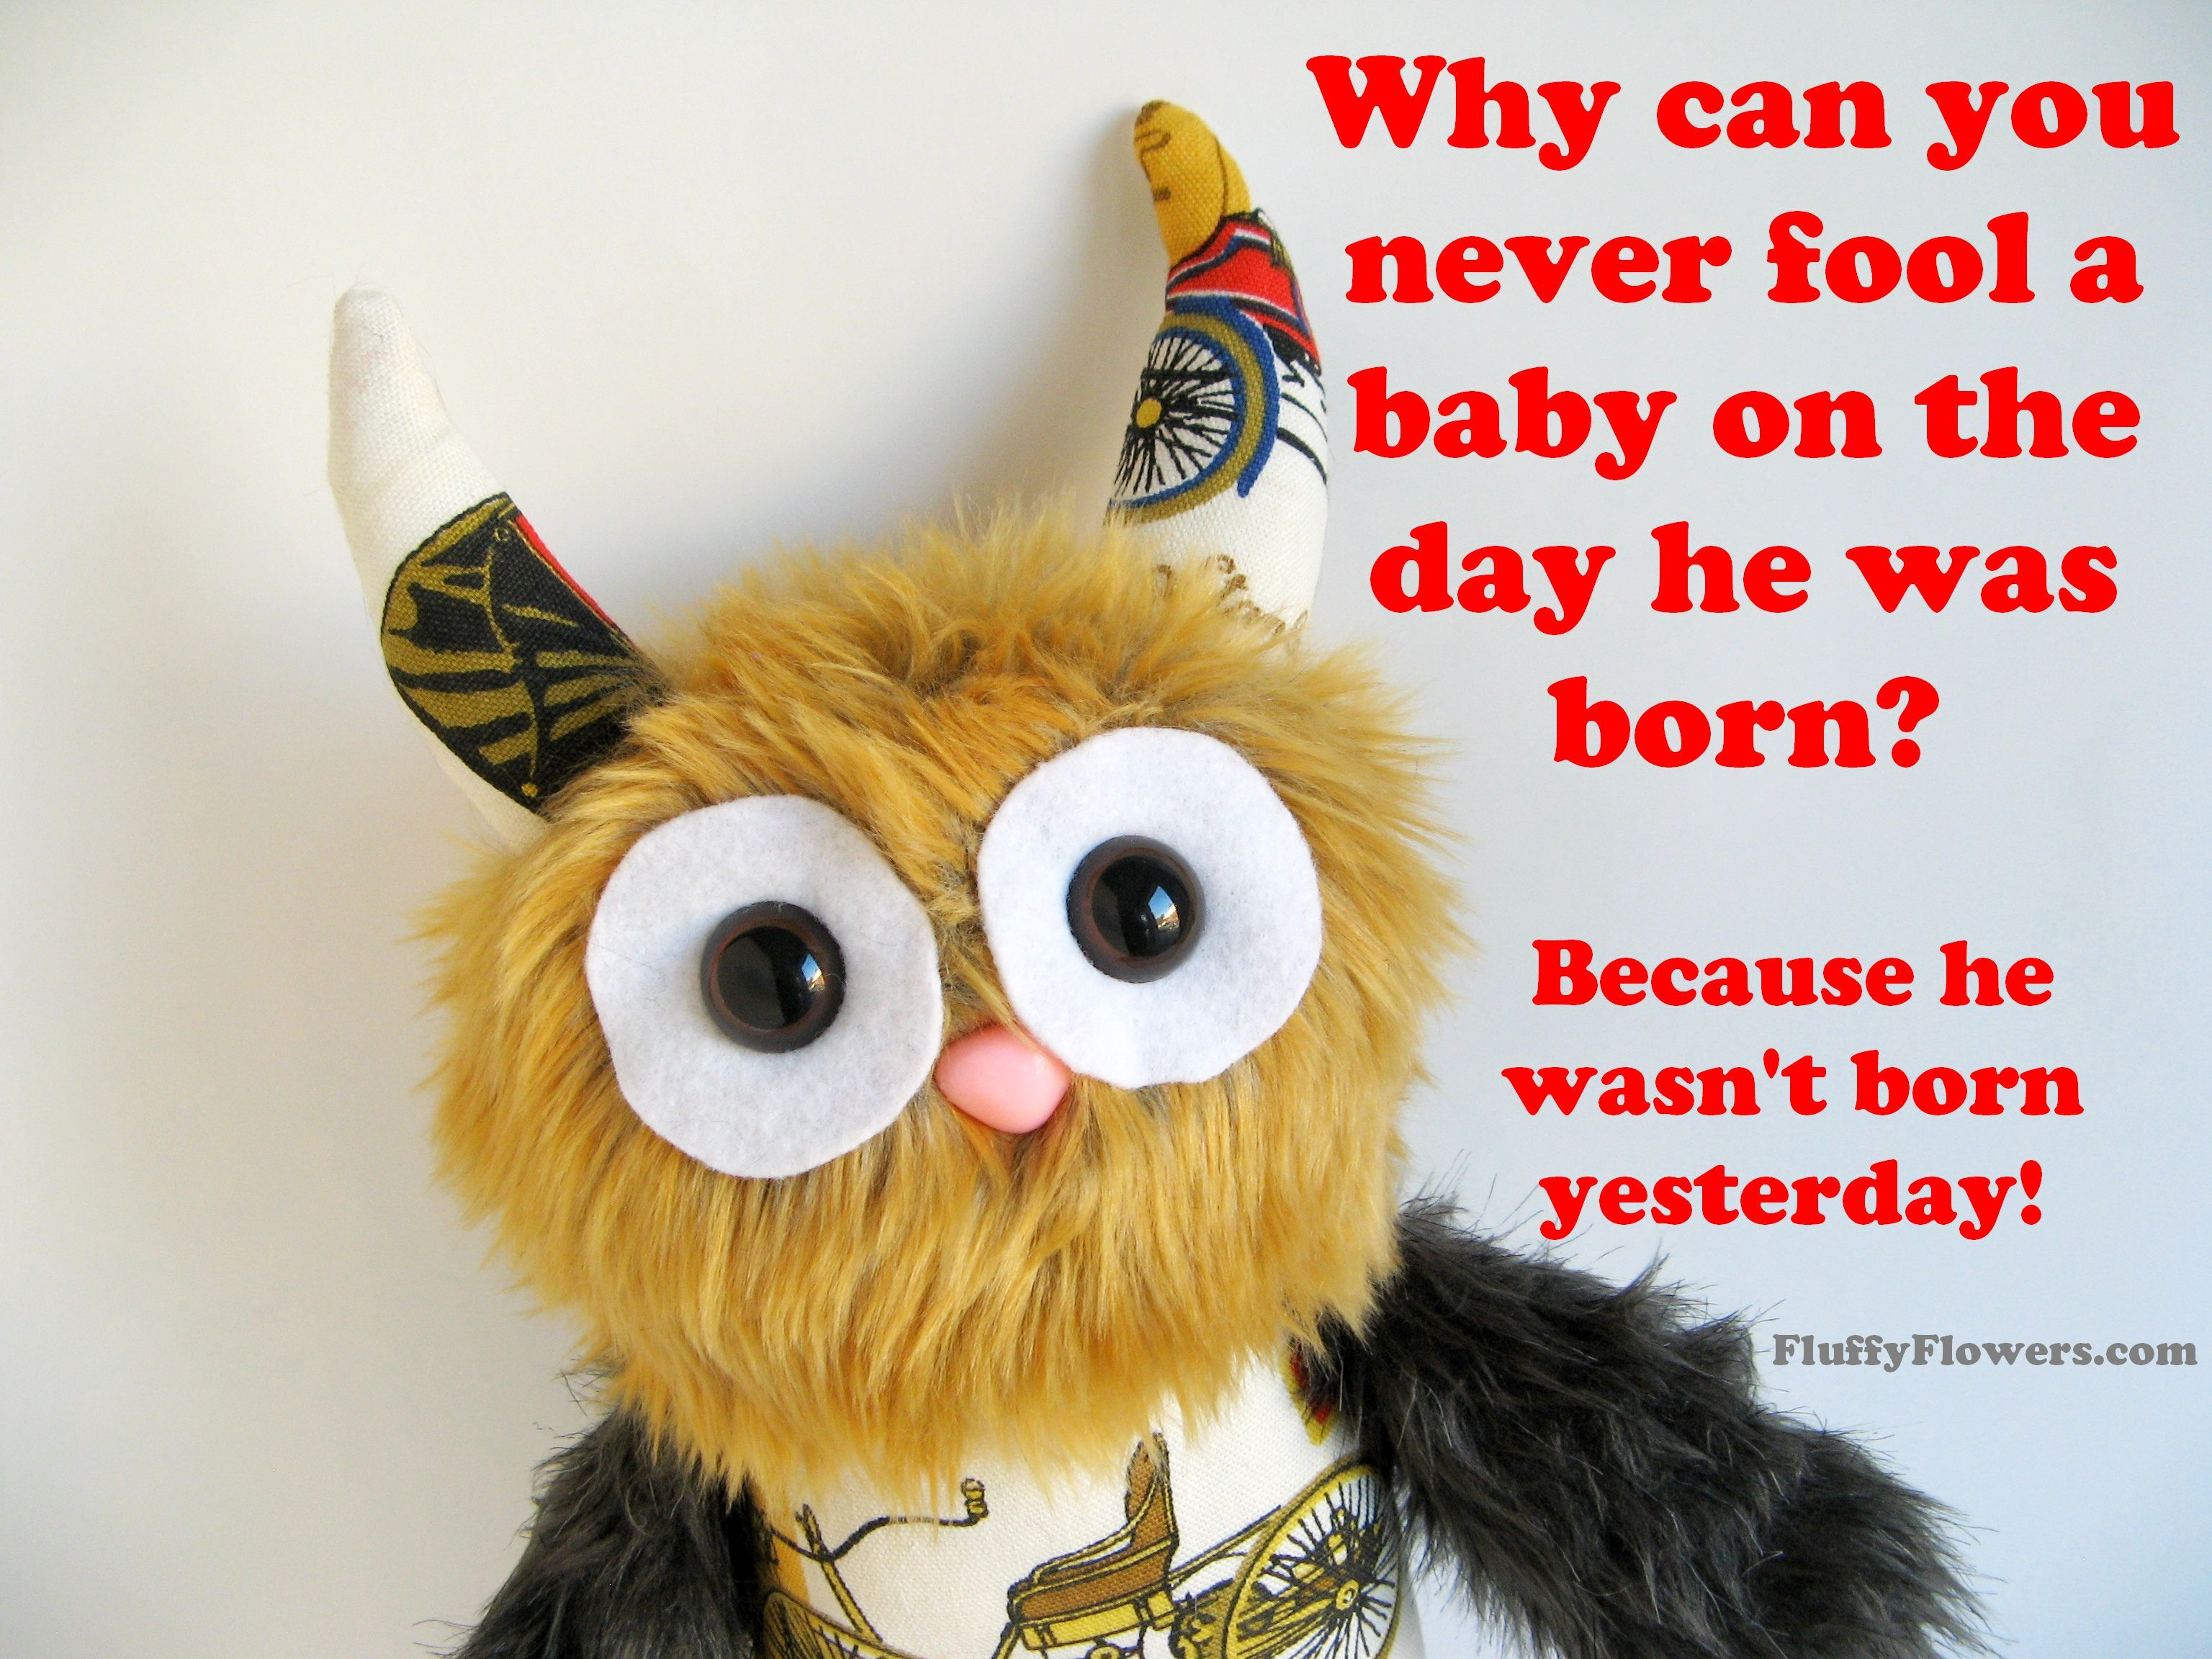 cute & clean new born baby joke for children featuring an